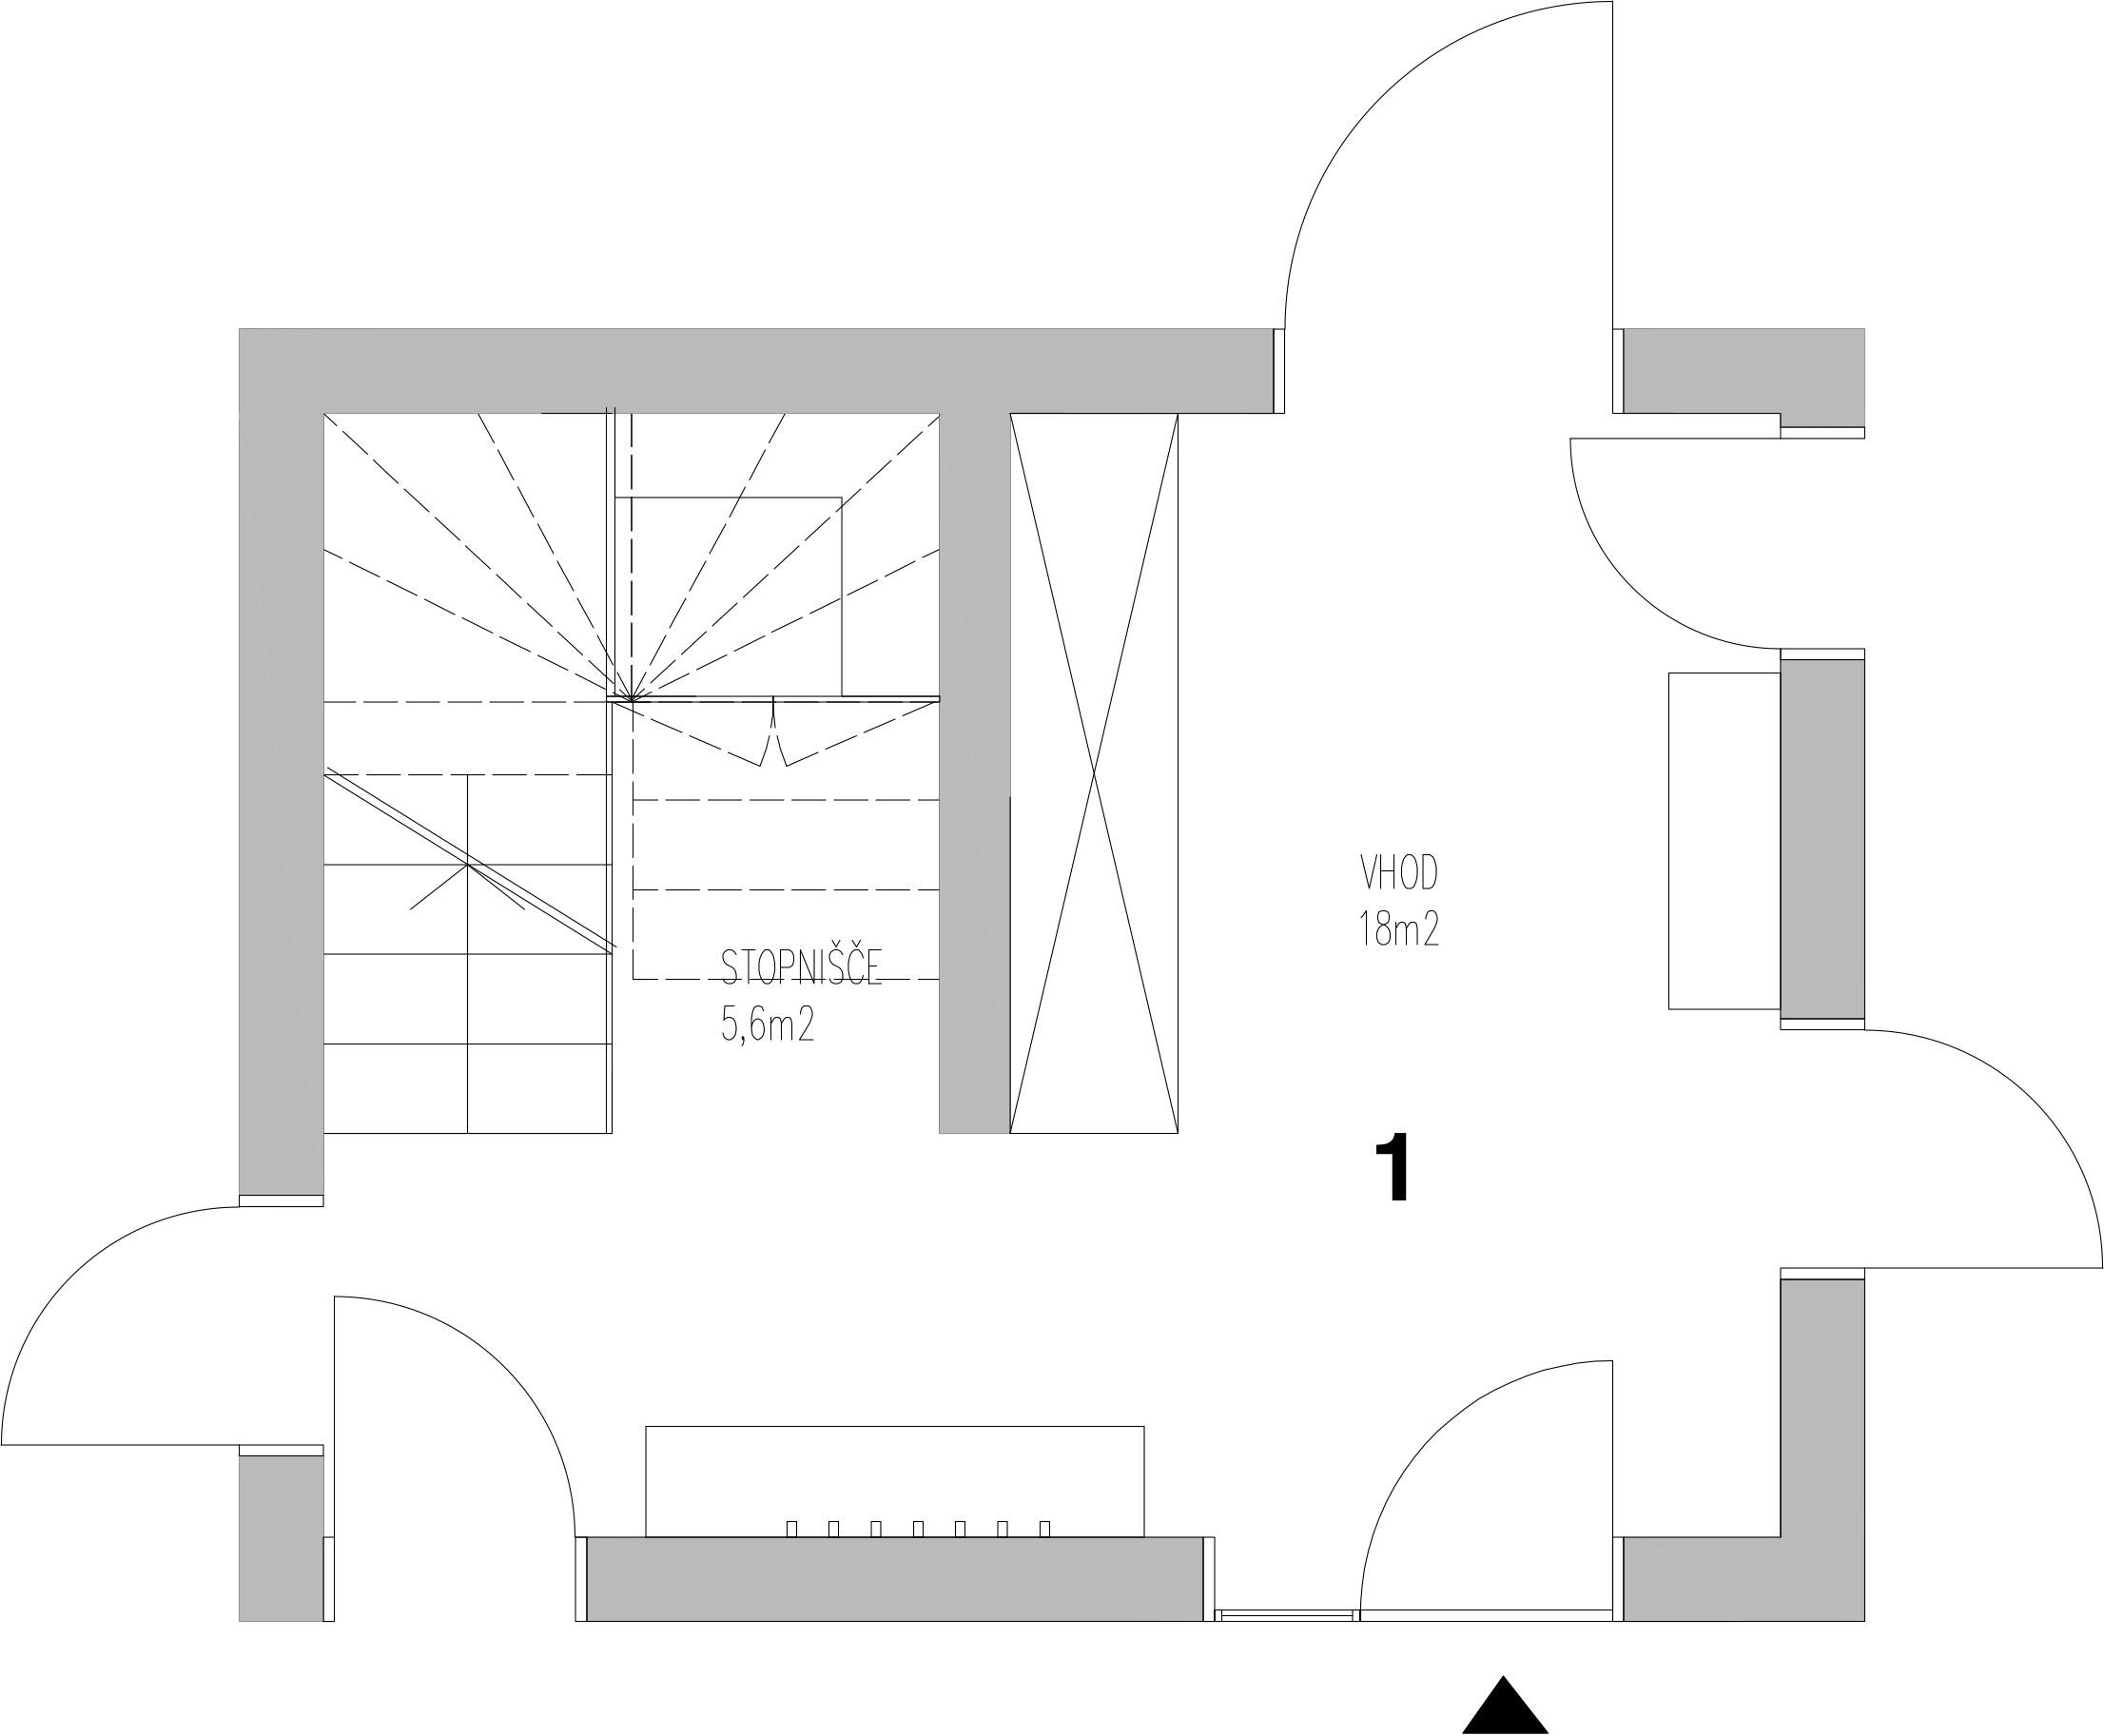 Ground floor - 1. Entrance